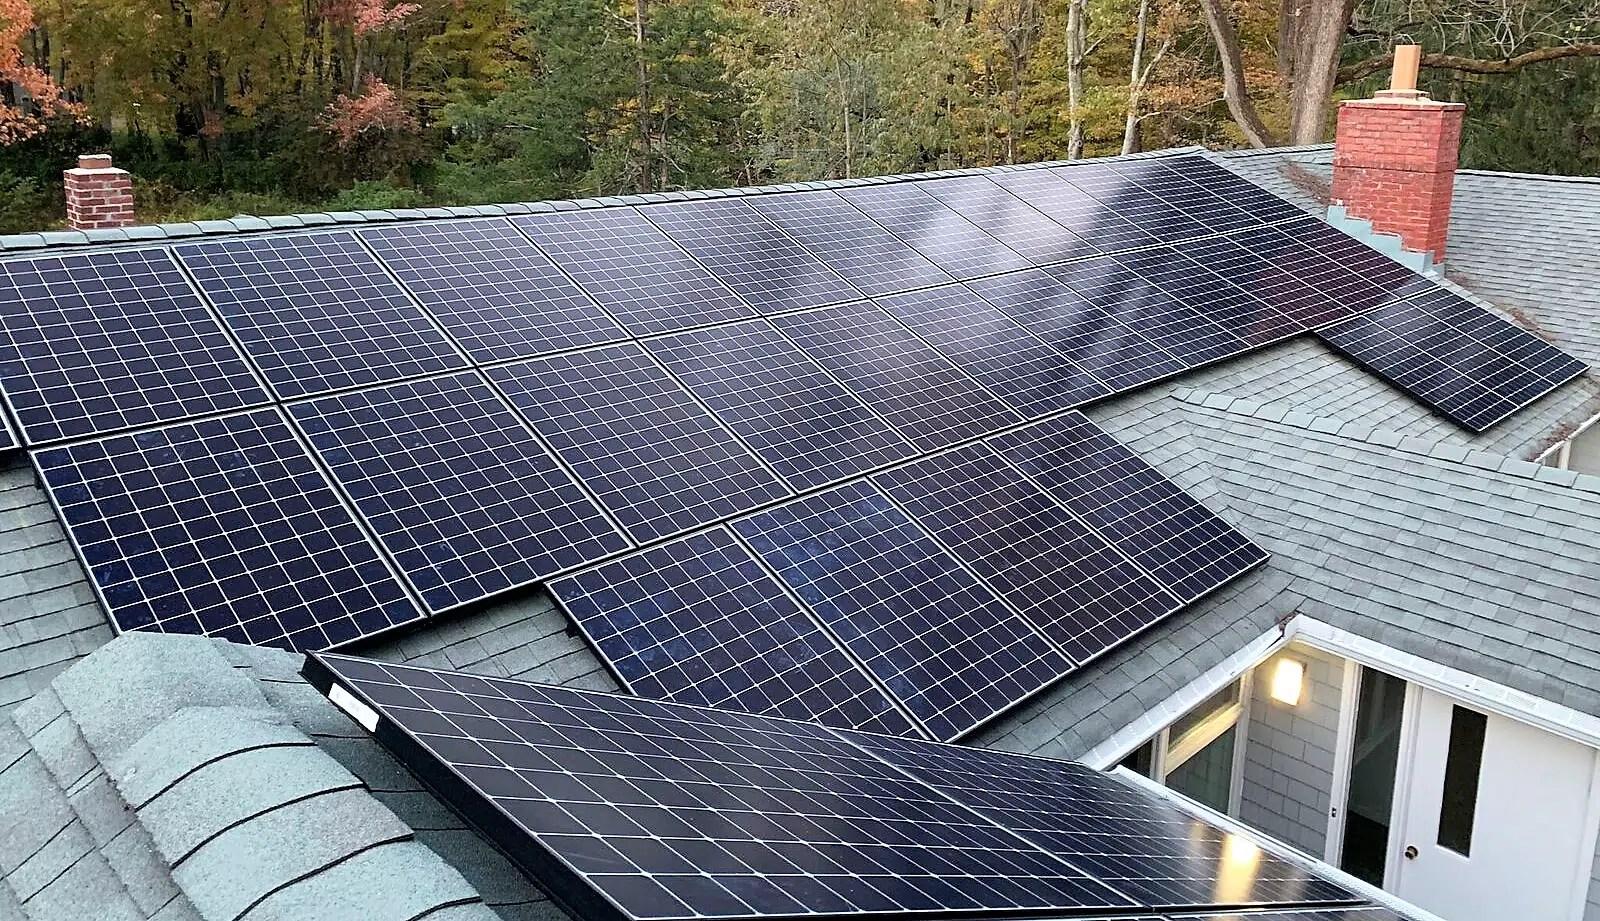 Residential Solar Installer Nj Home Solar Systems By Greenhouse Solar